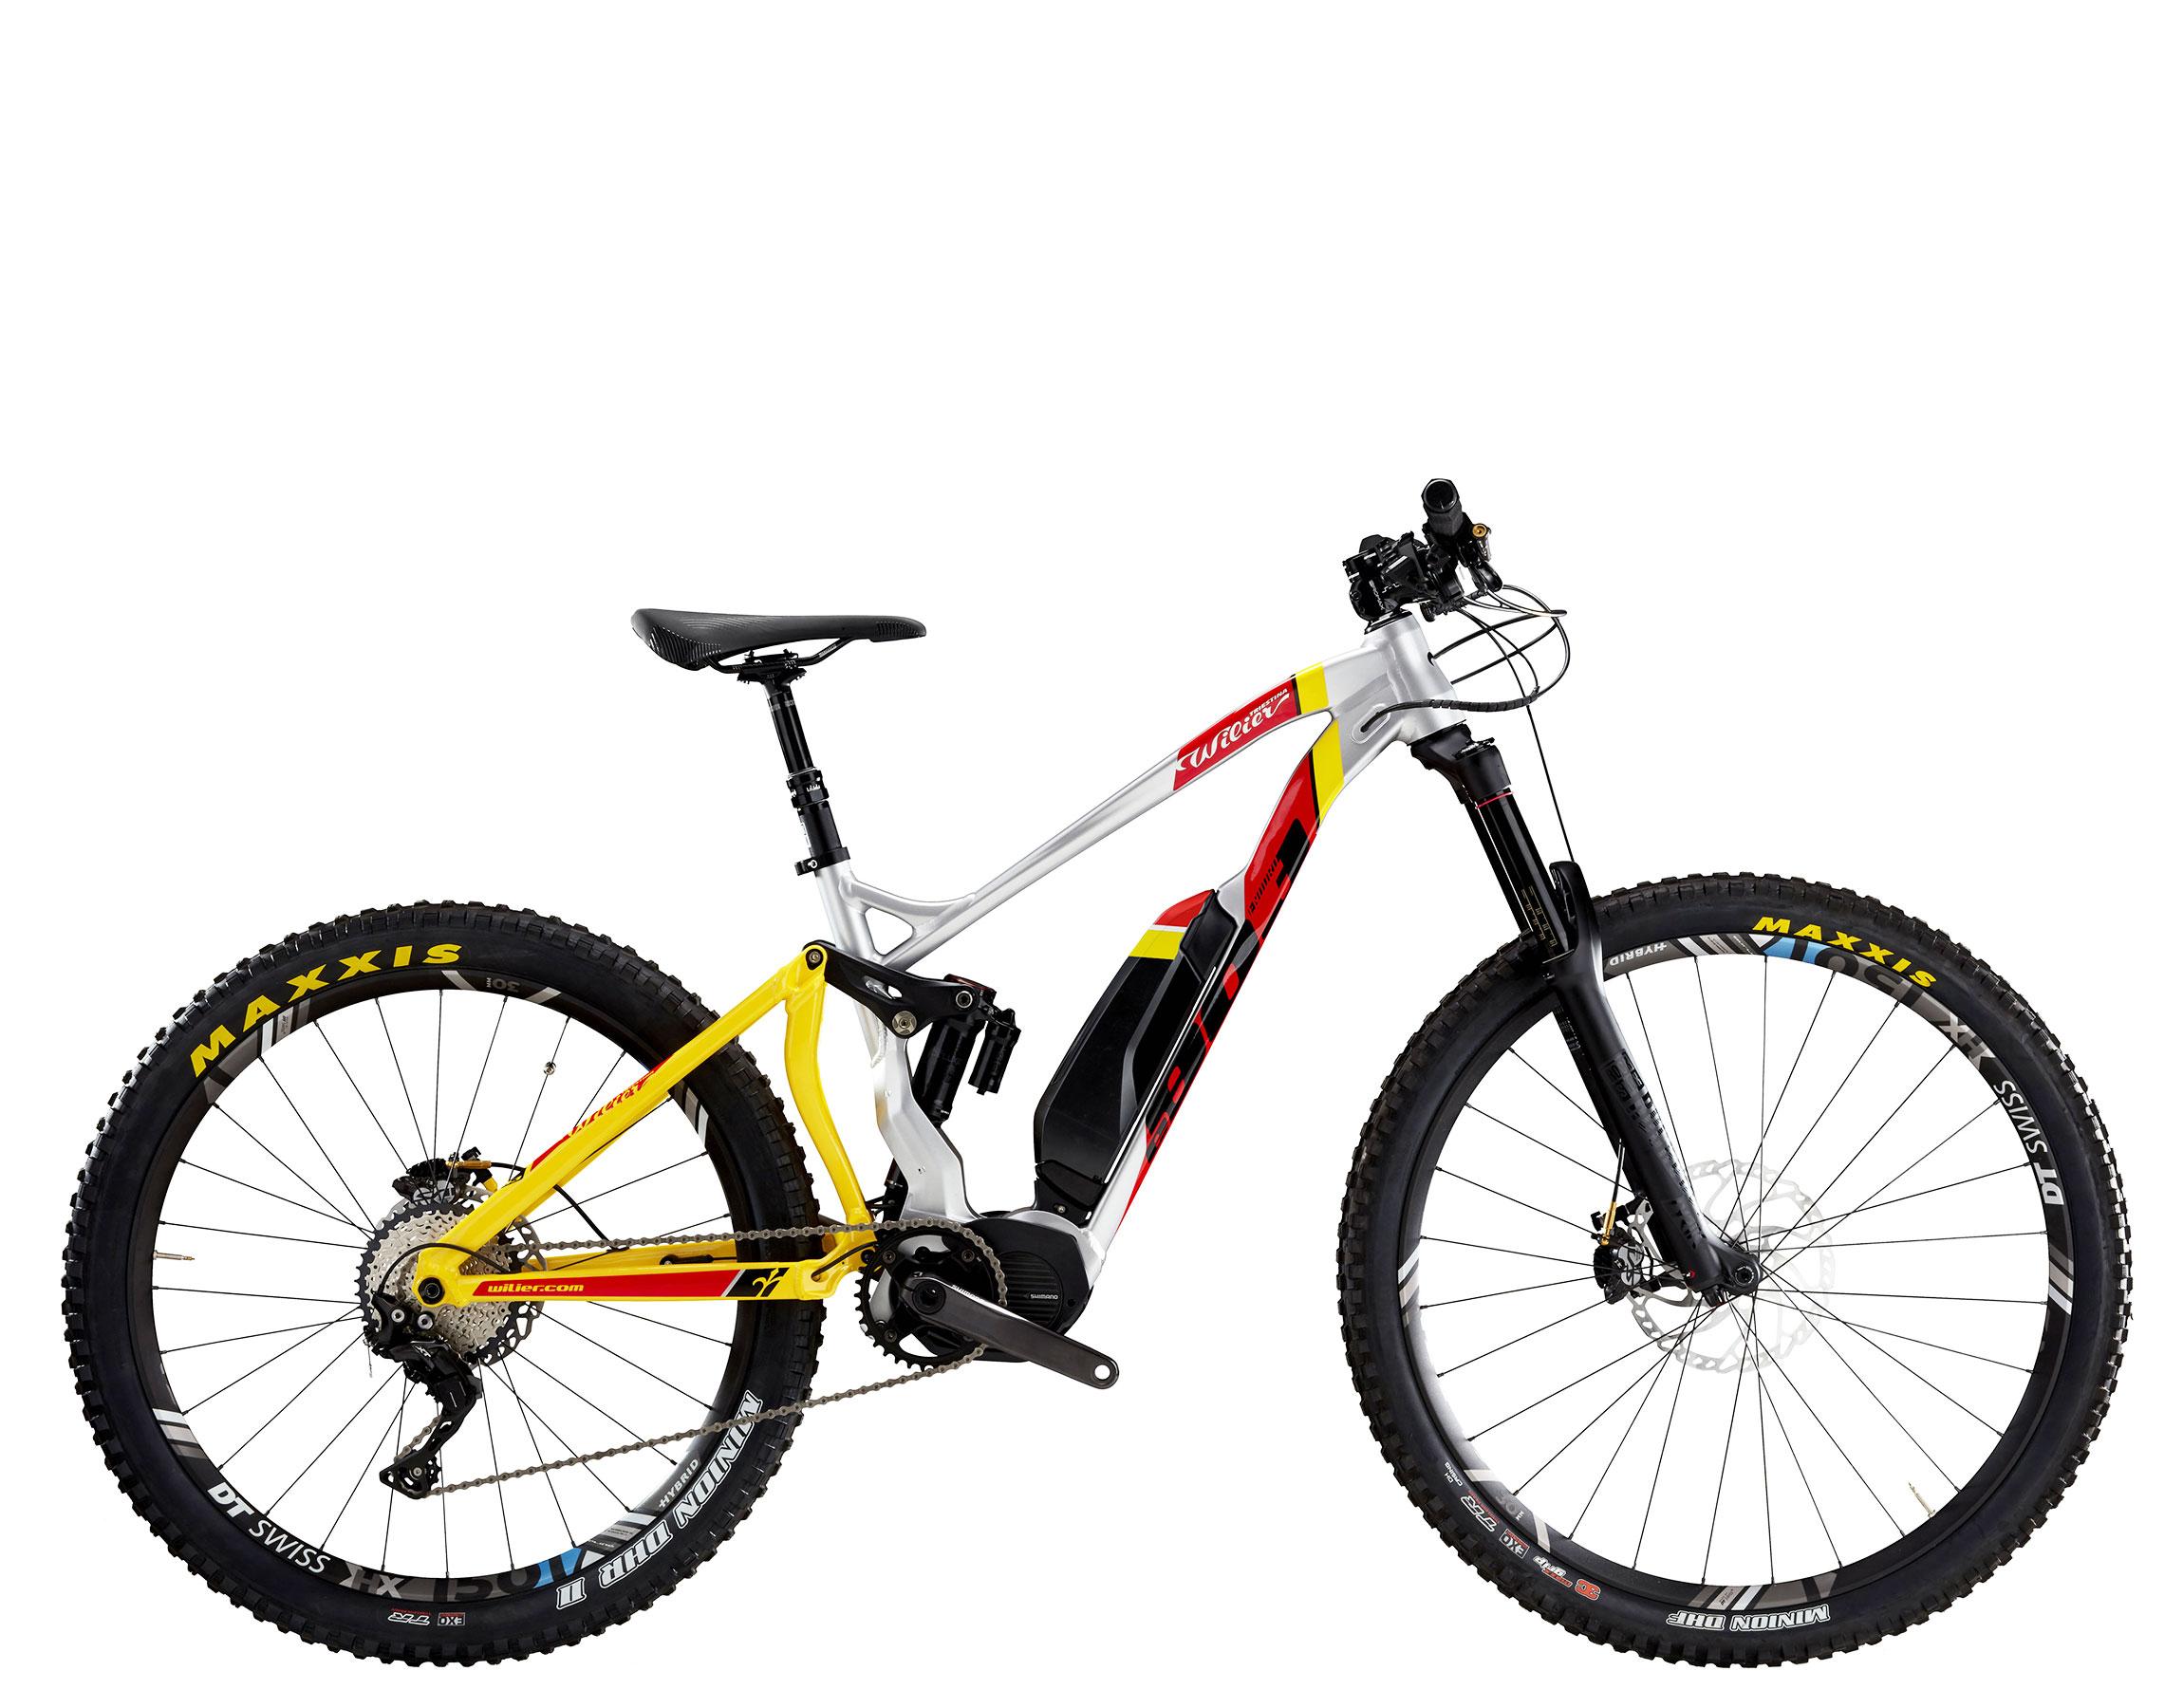 Wilier E803 Enduro XT Full Suspension Mountain E-Bike - 2019 (All sizes) £2518.99 merlincycles